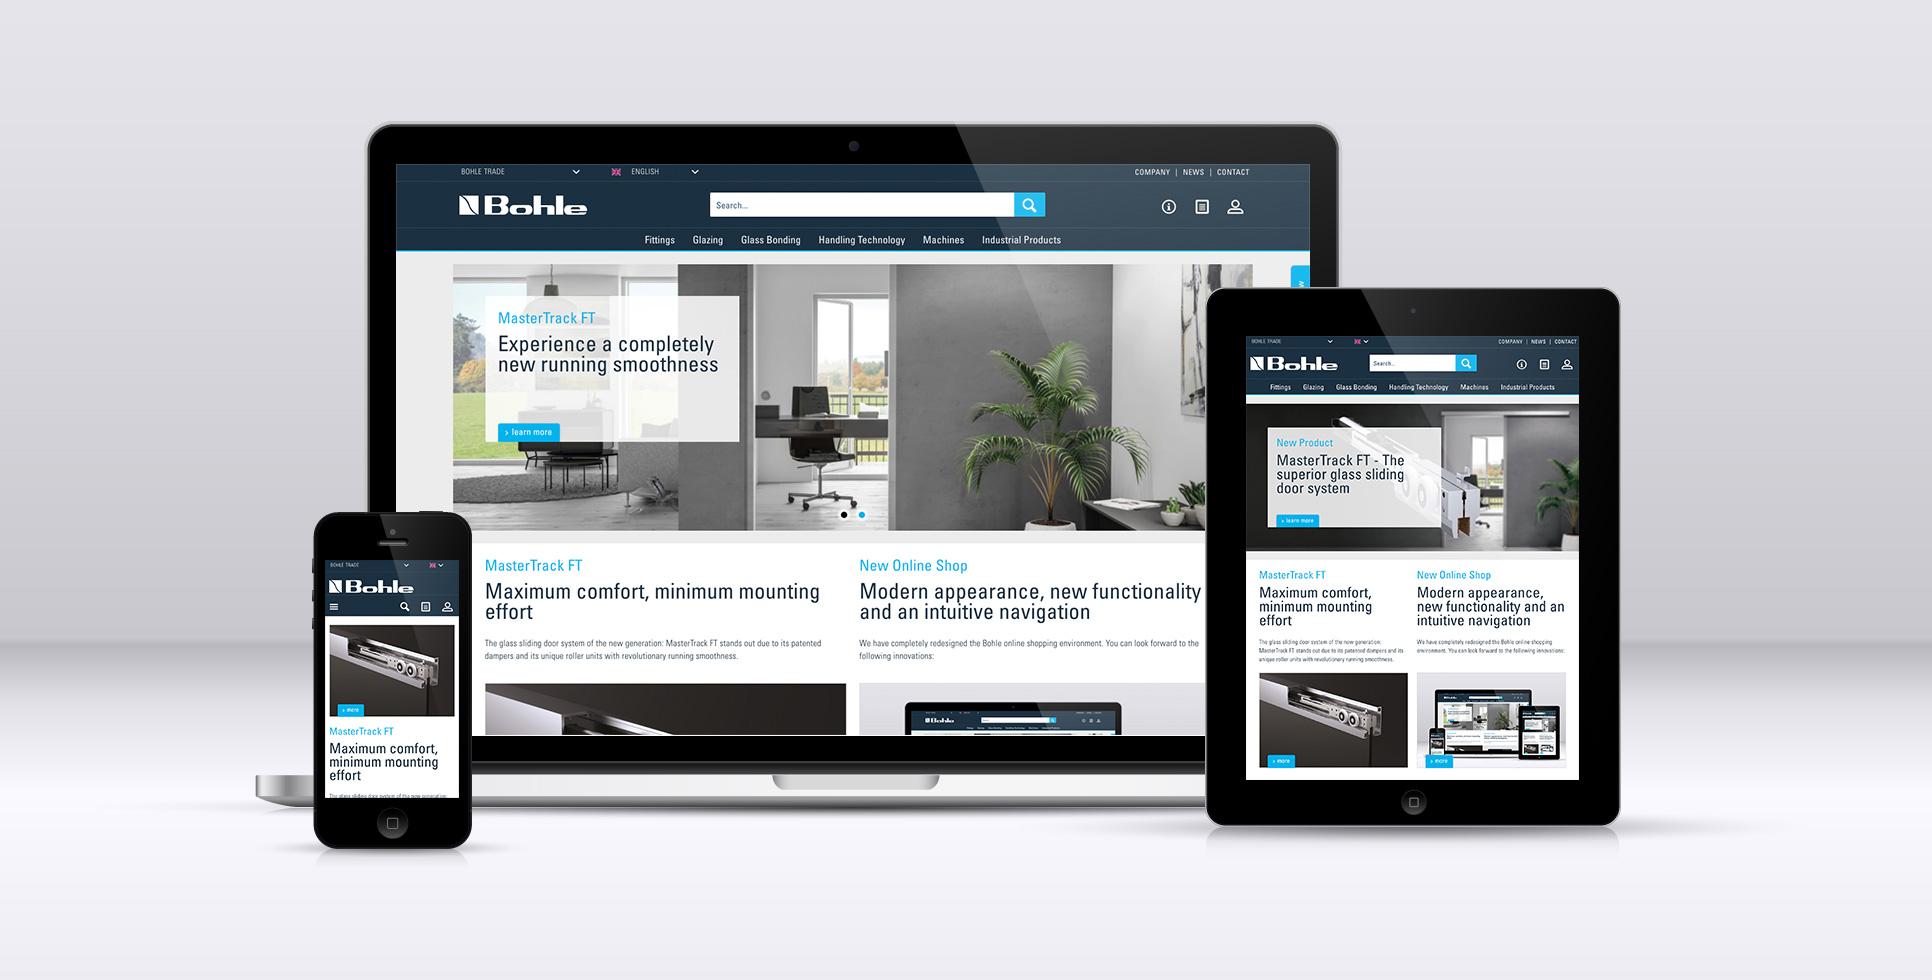 Neuer Online Shop | News | Bohle AG